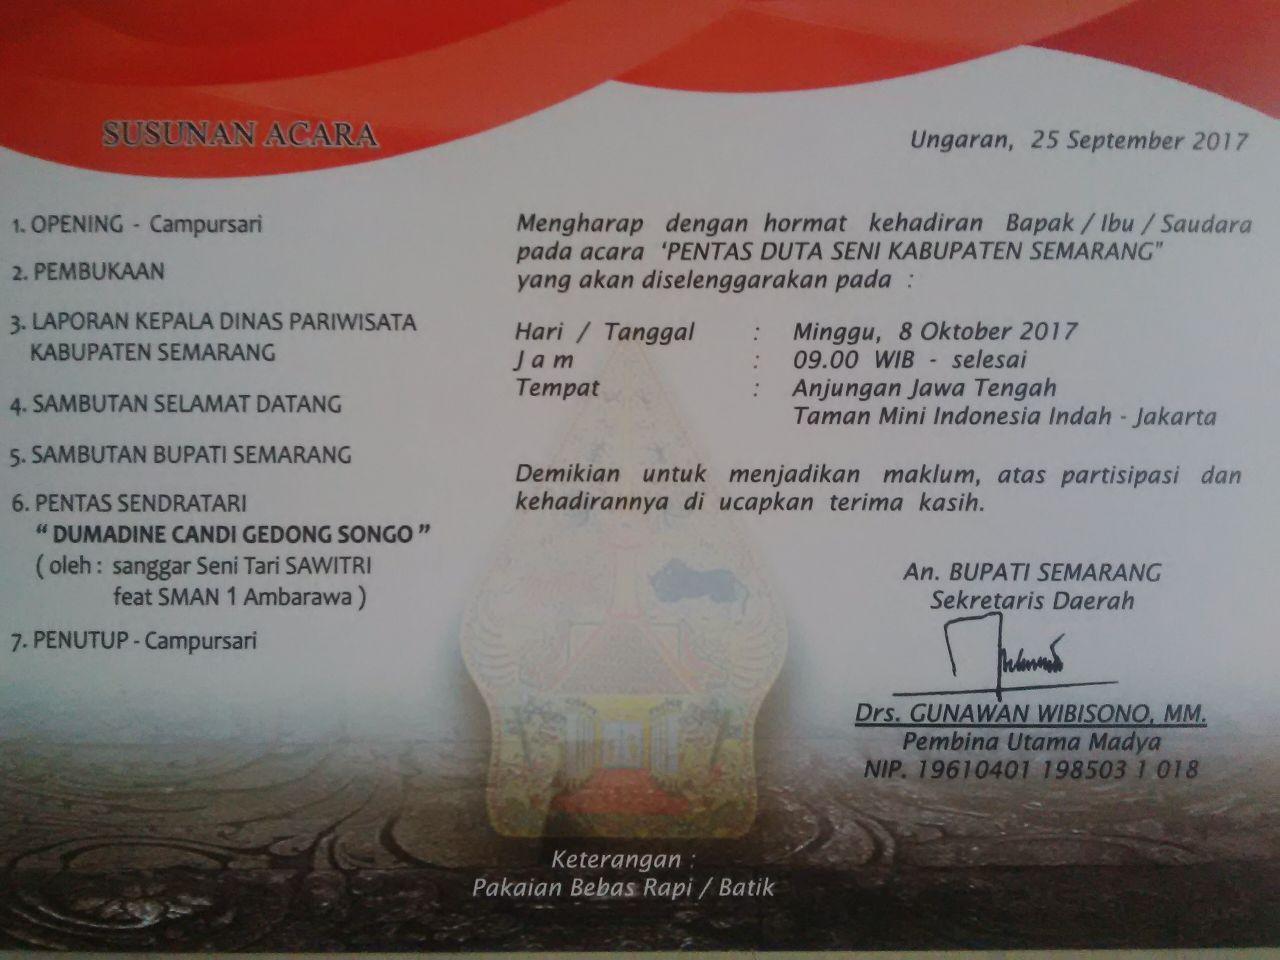 Pentas Duta Seni Kab Semarang Tourism Information Center Sanggar Gedong